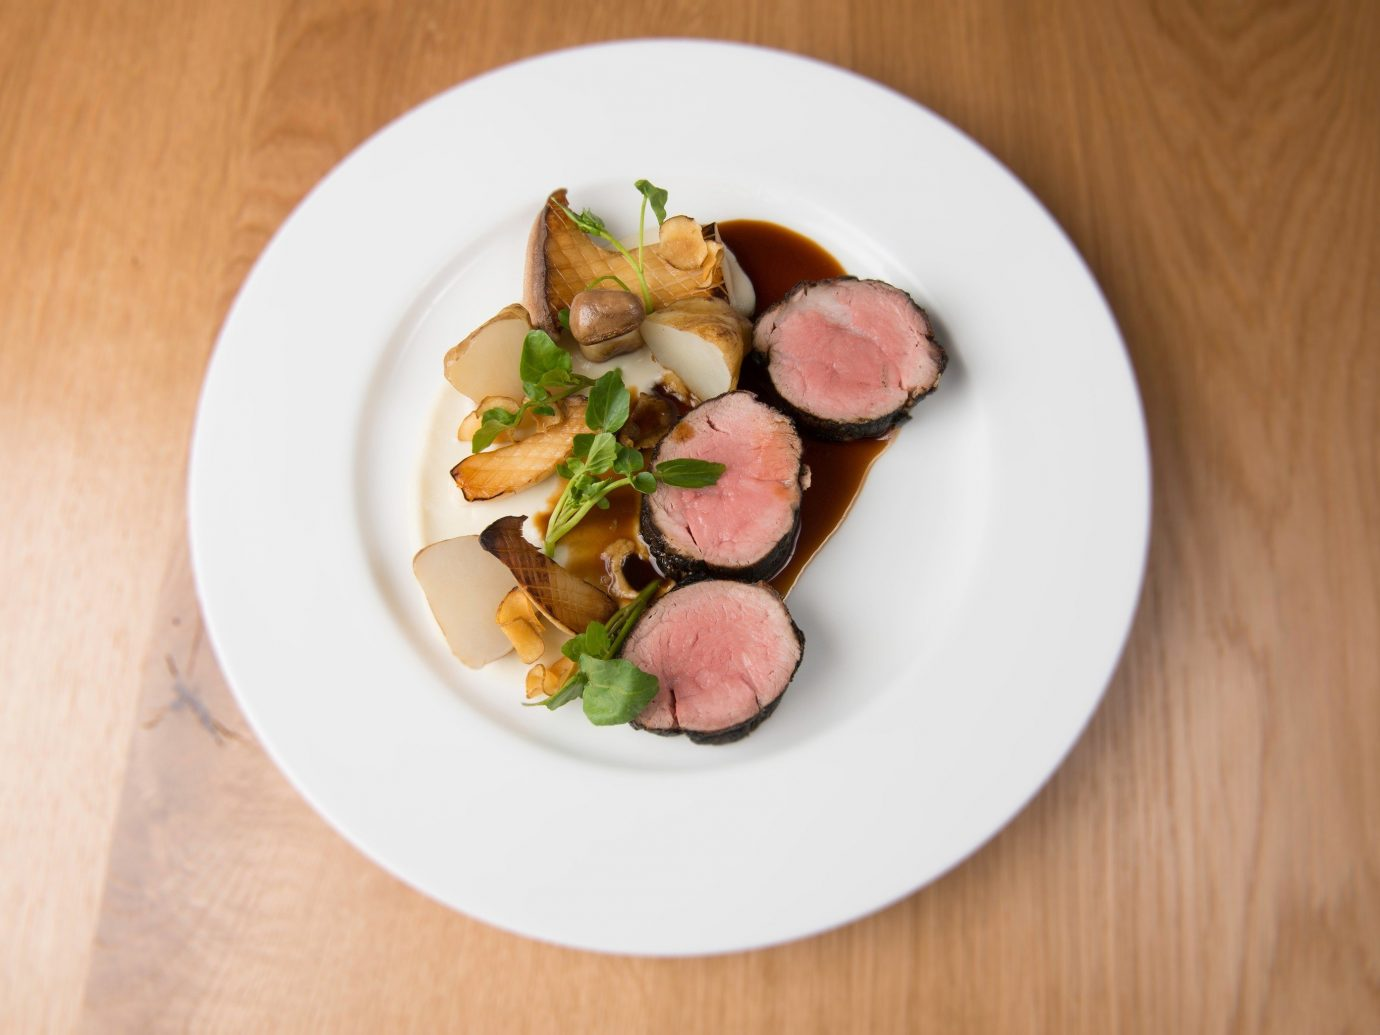 Food + Drink plate food table dish indoor meal produce cuisine meat wooden vegetable breakfast sliced